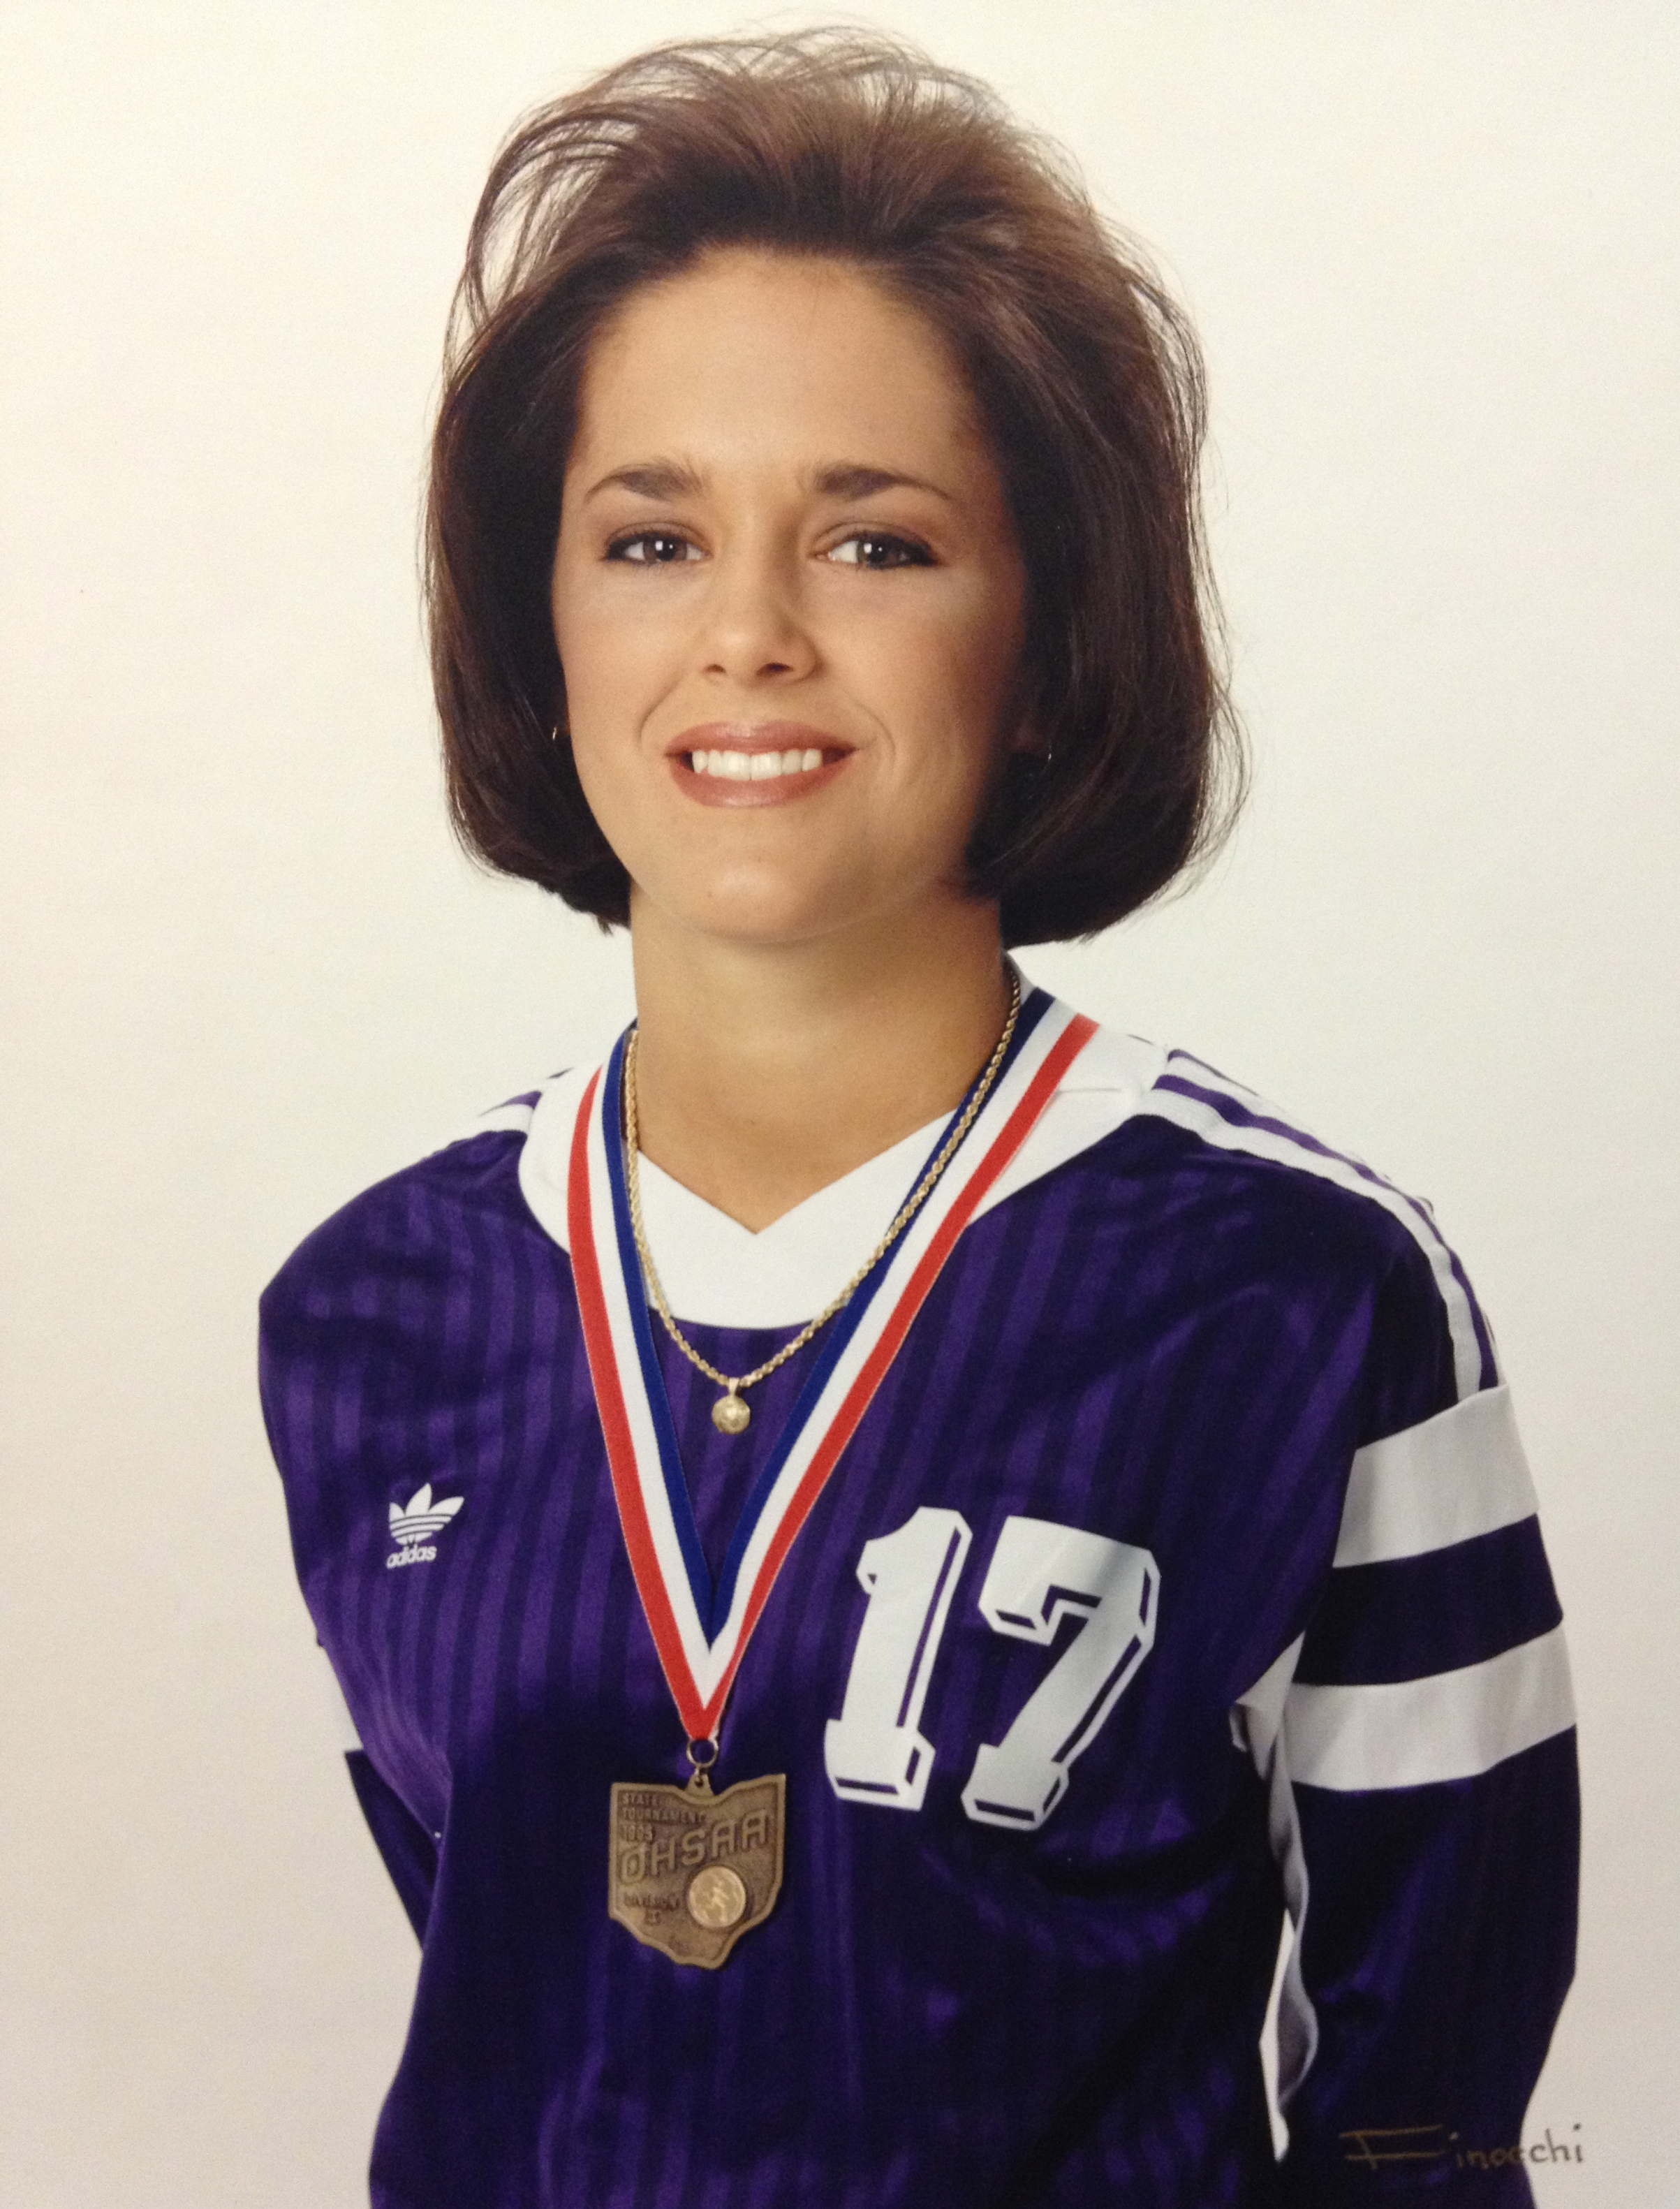 Melissa Fox 1995